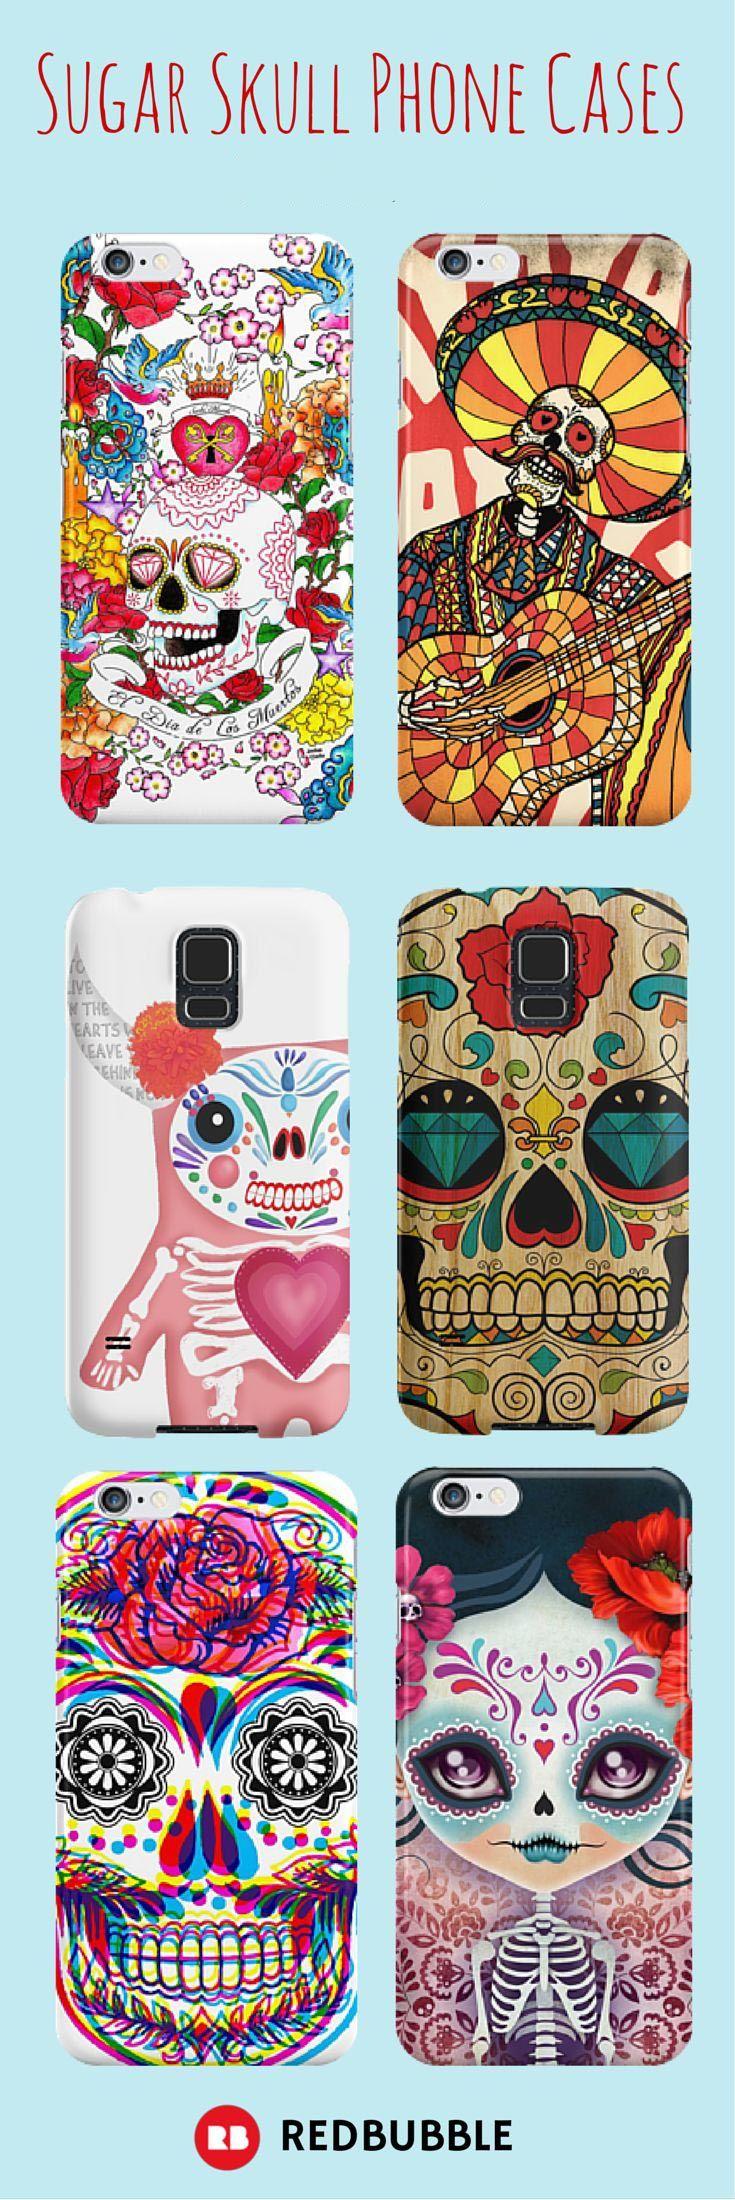 Celebrate Dia De Los Muertos every day with these sugar skull phone cases. #diadelosmuertos